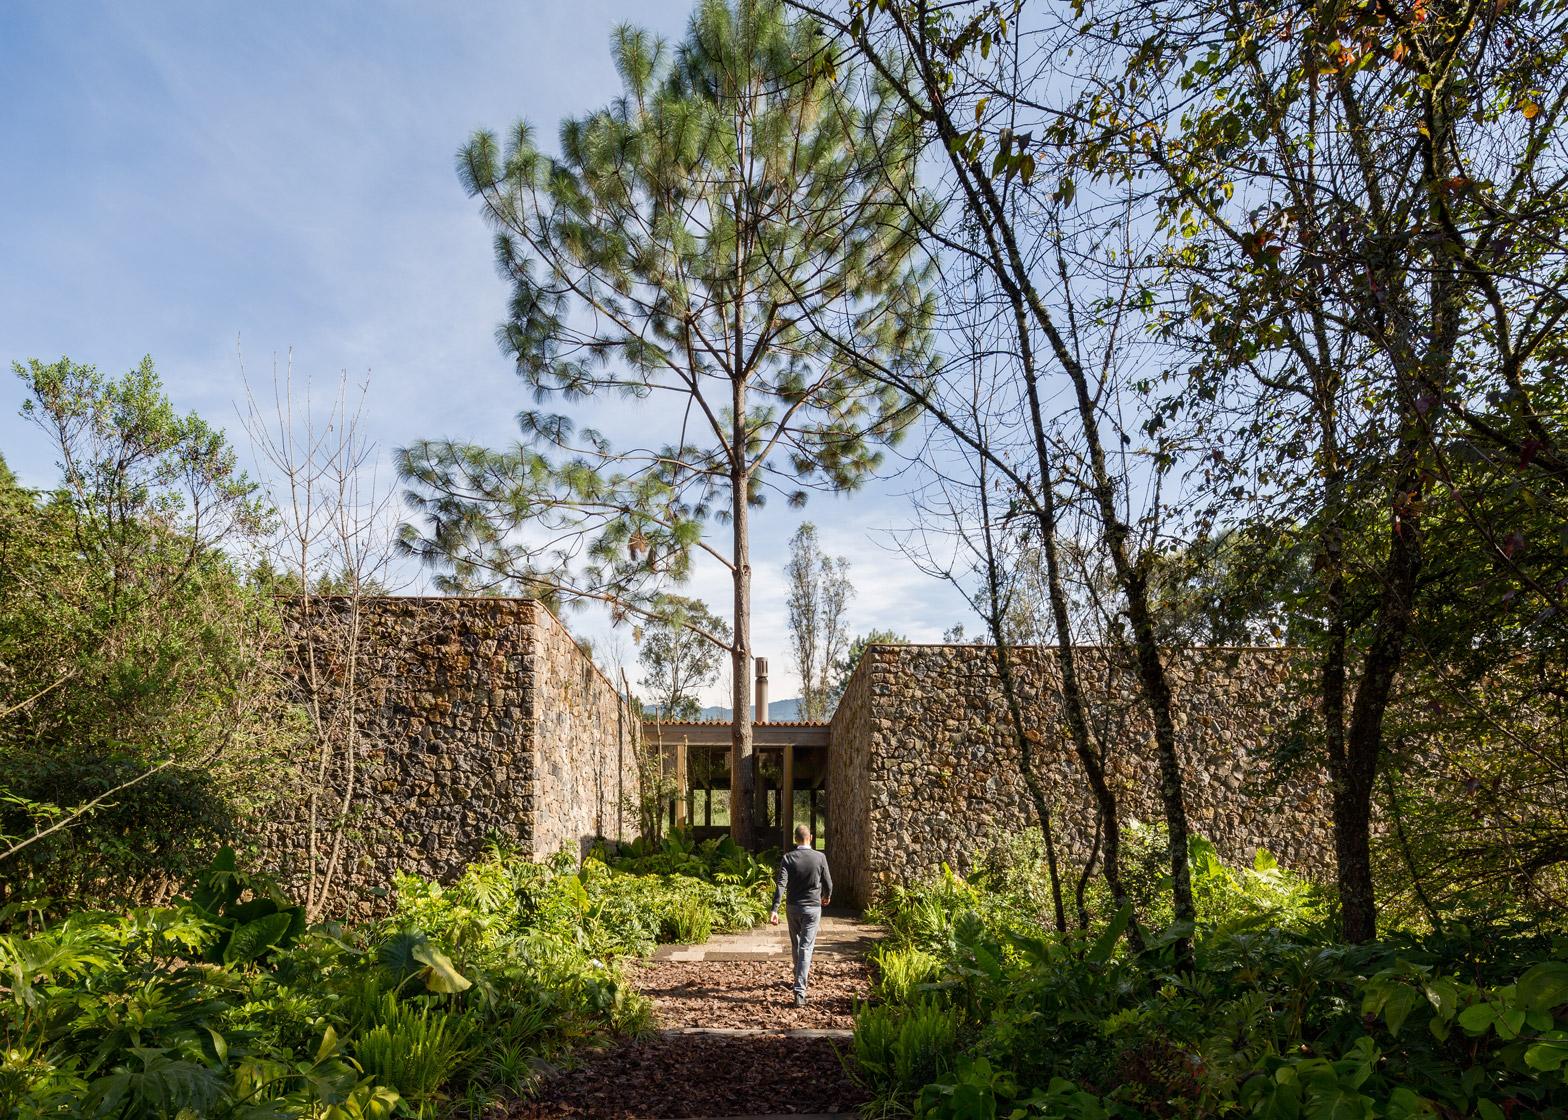 santana-house-cc-arquitectos-valle-de-bravo-mexico-city_dezeen_1568_8.jpg